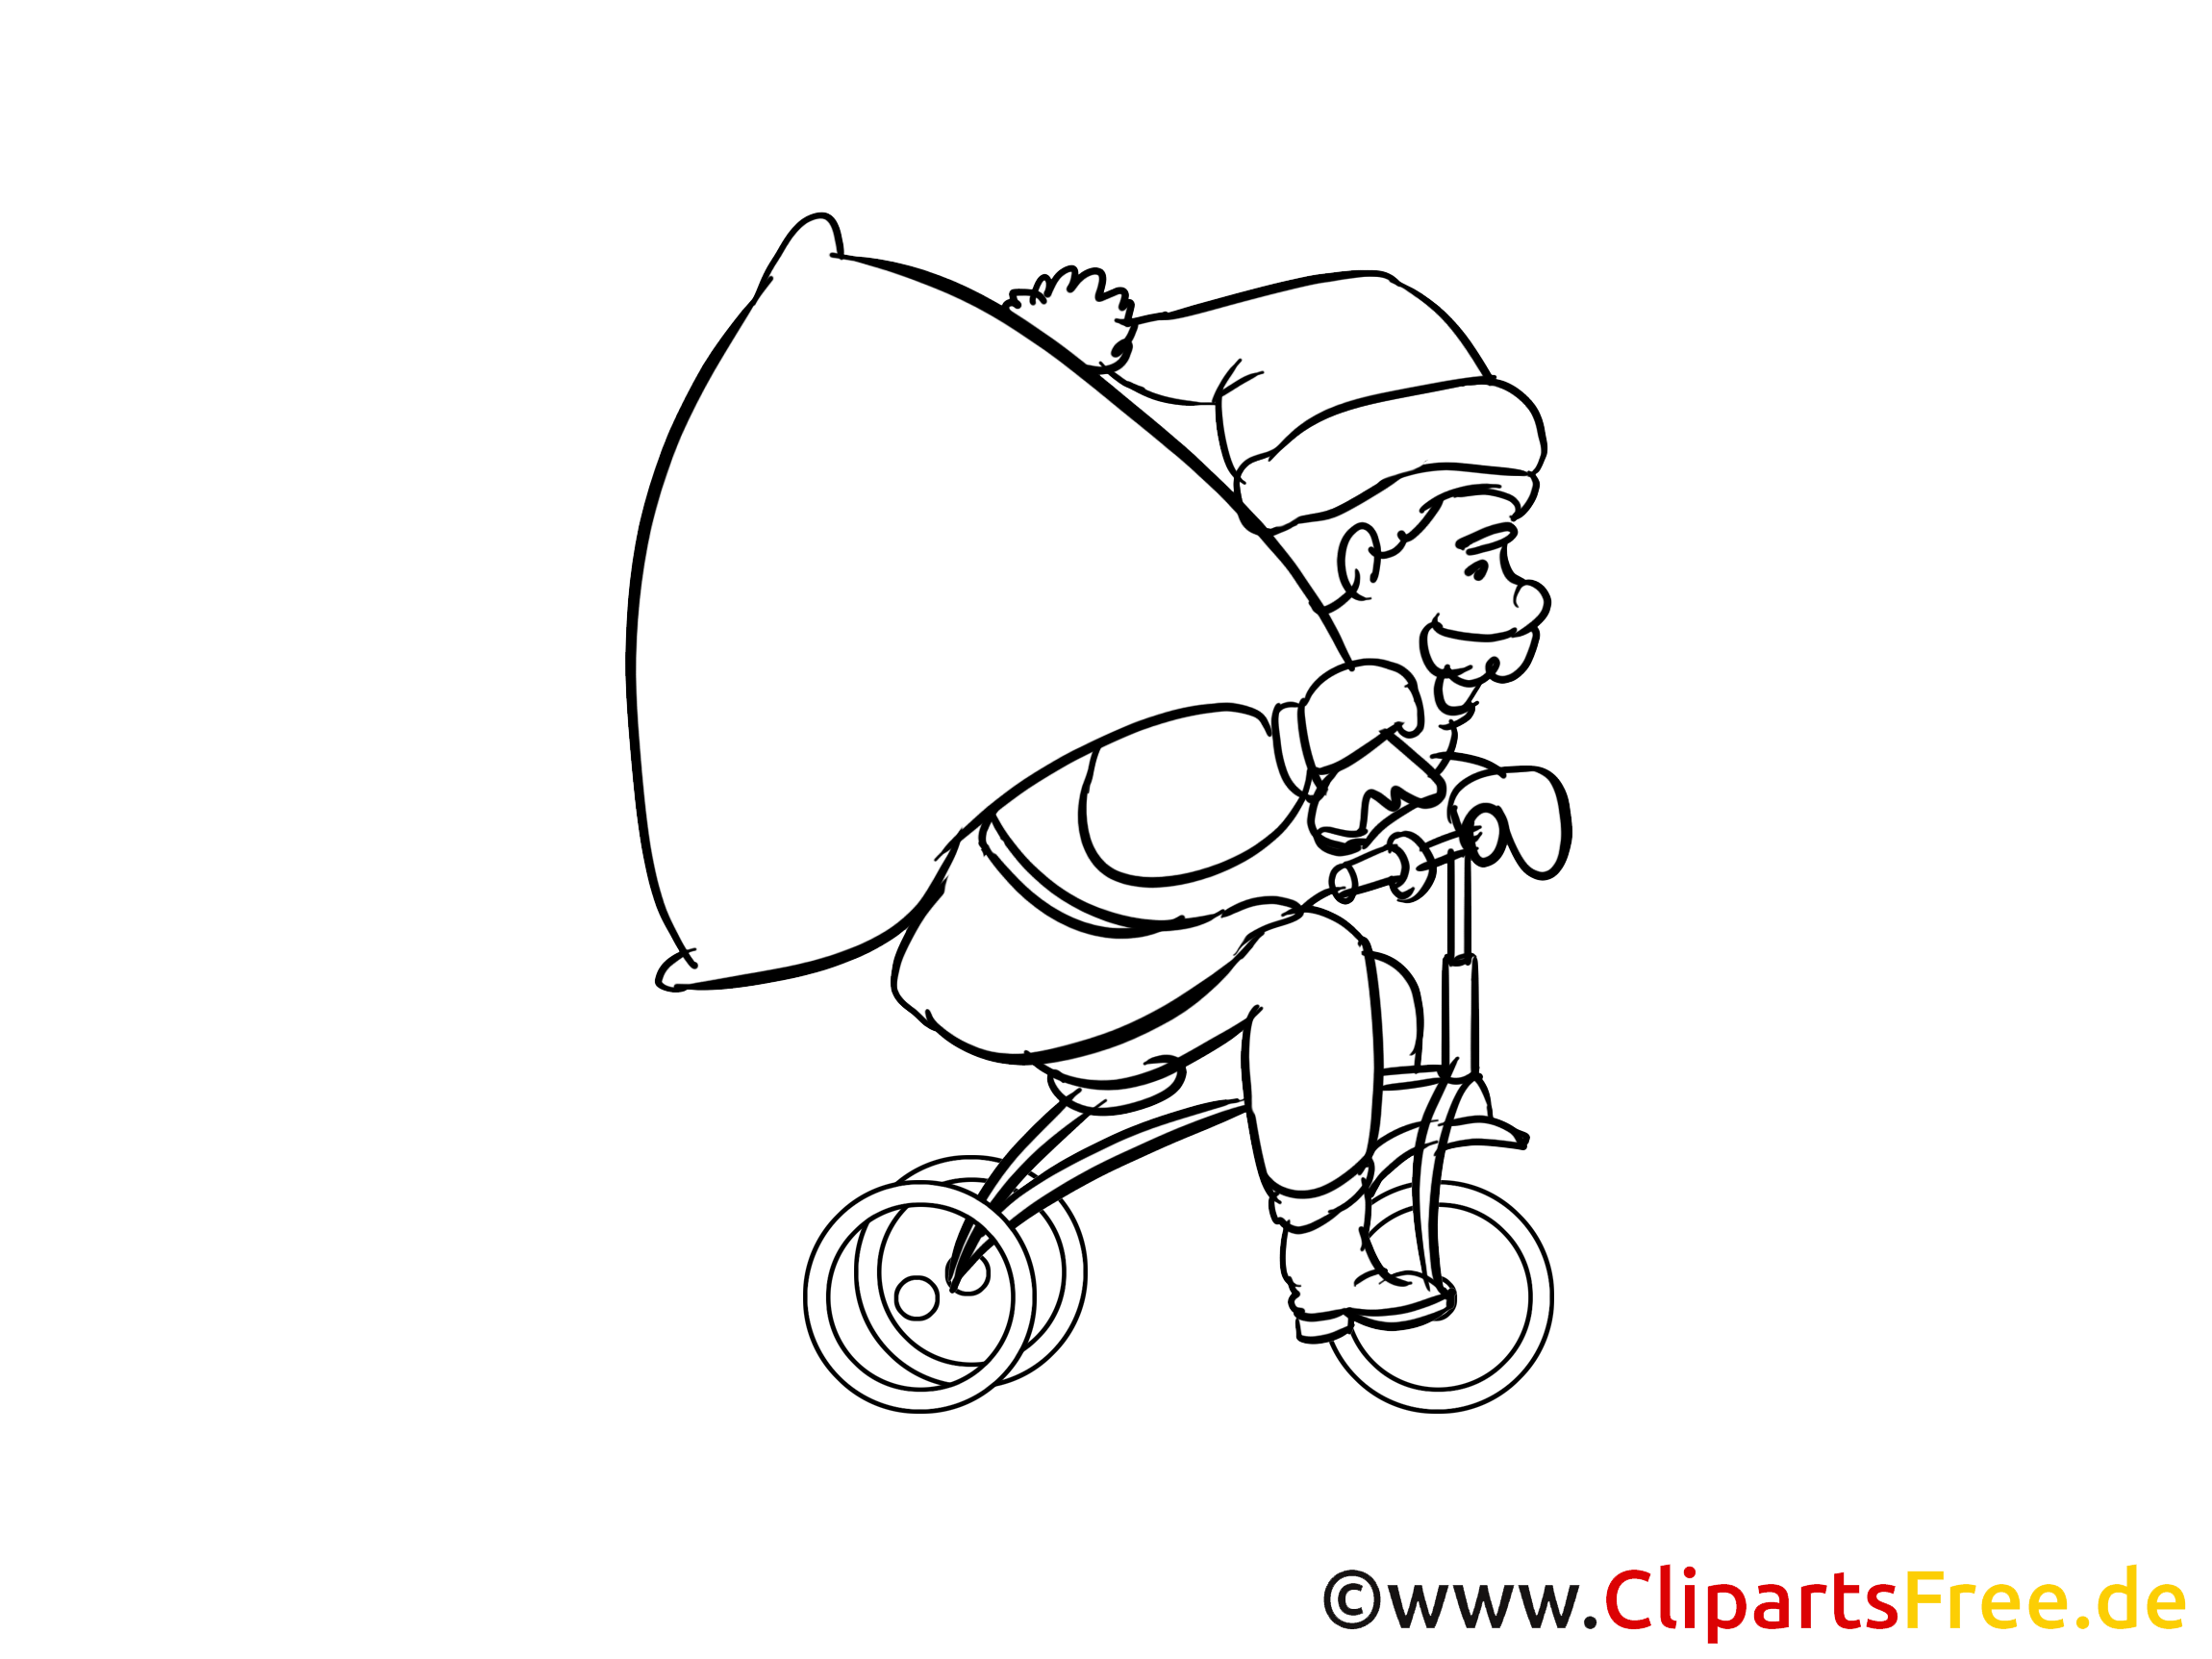 Santa Claus Am Fahrrad Bild Zum Ausmalen